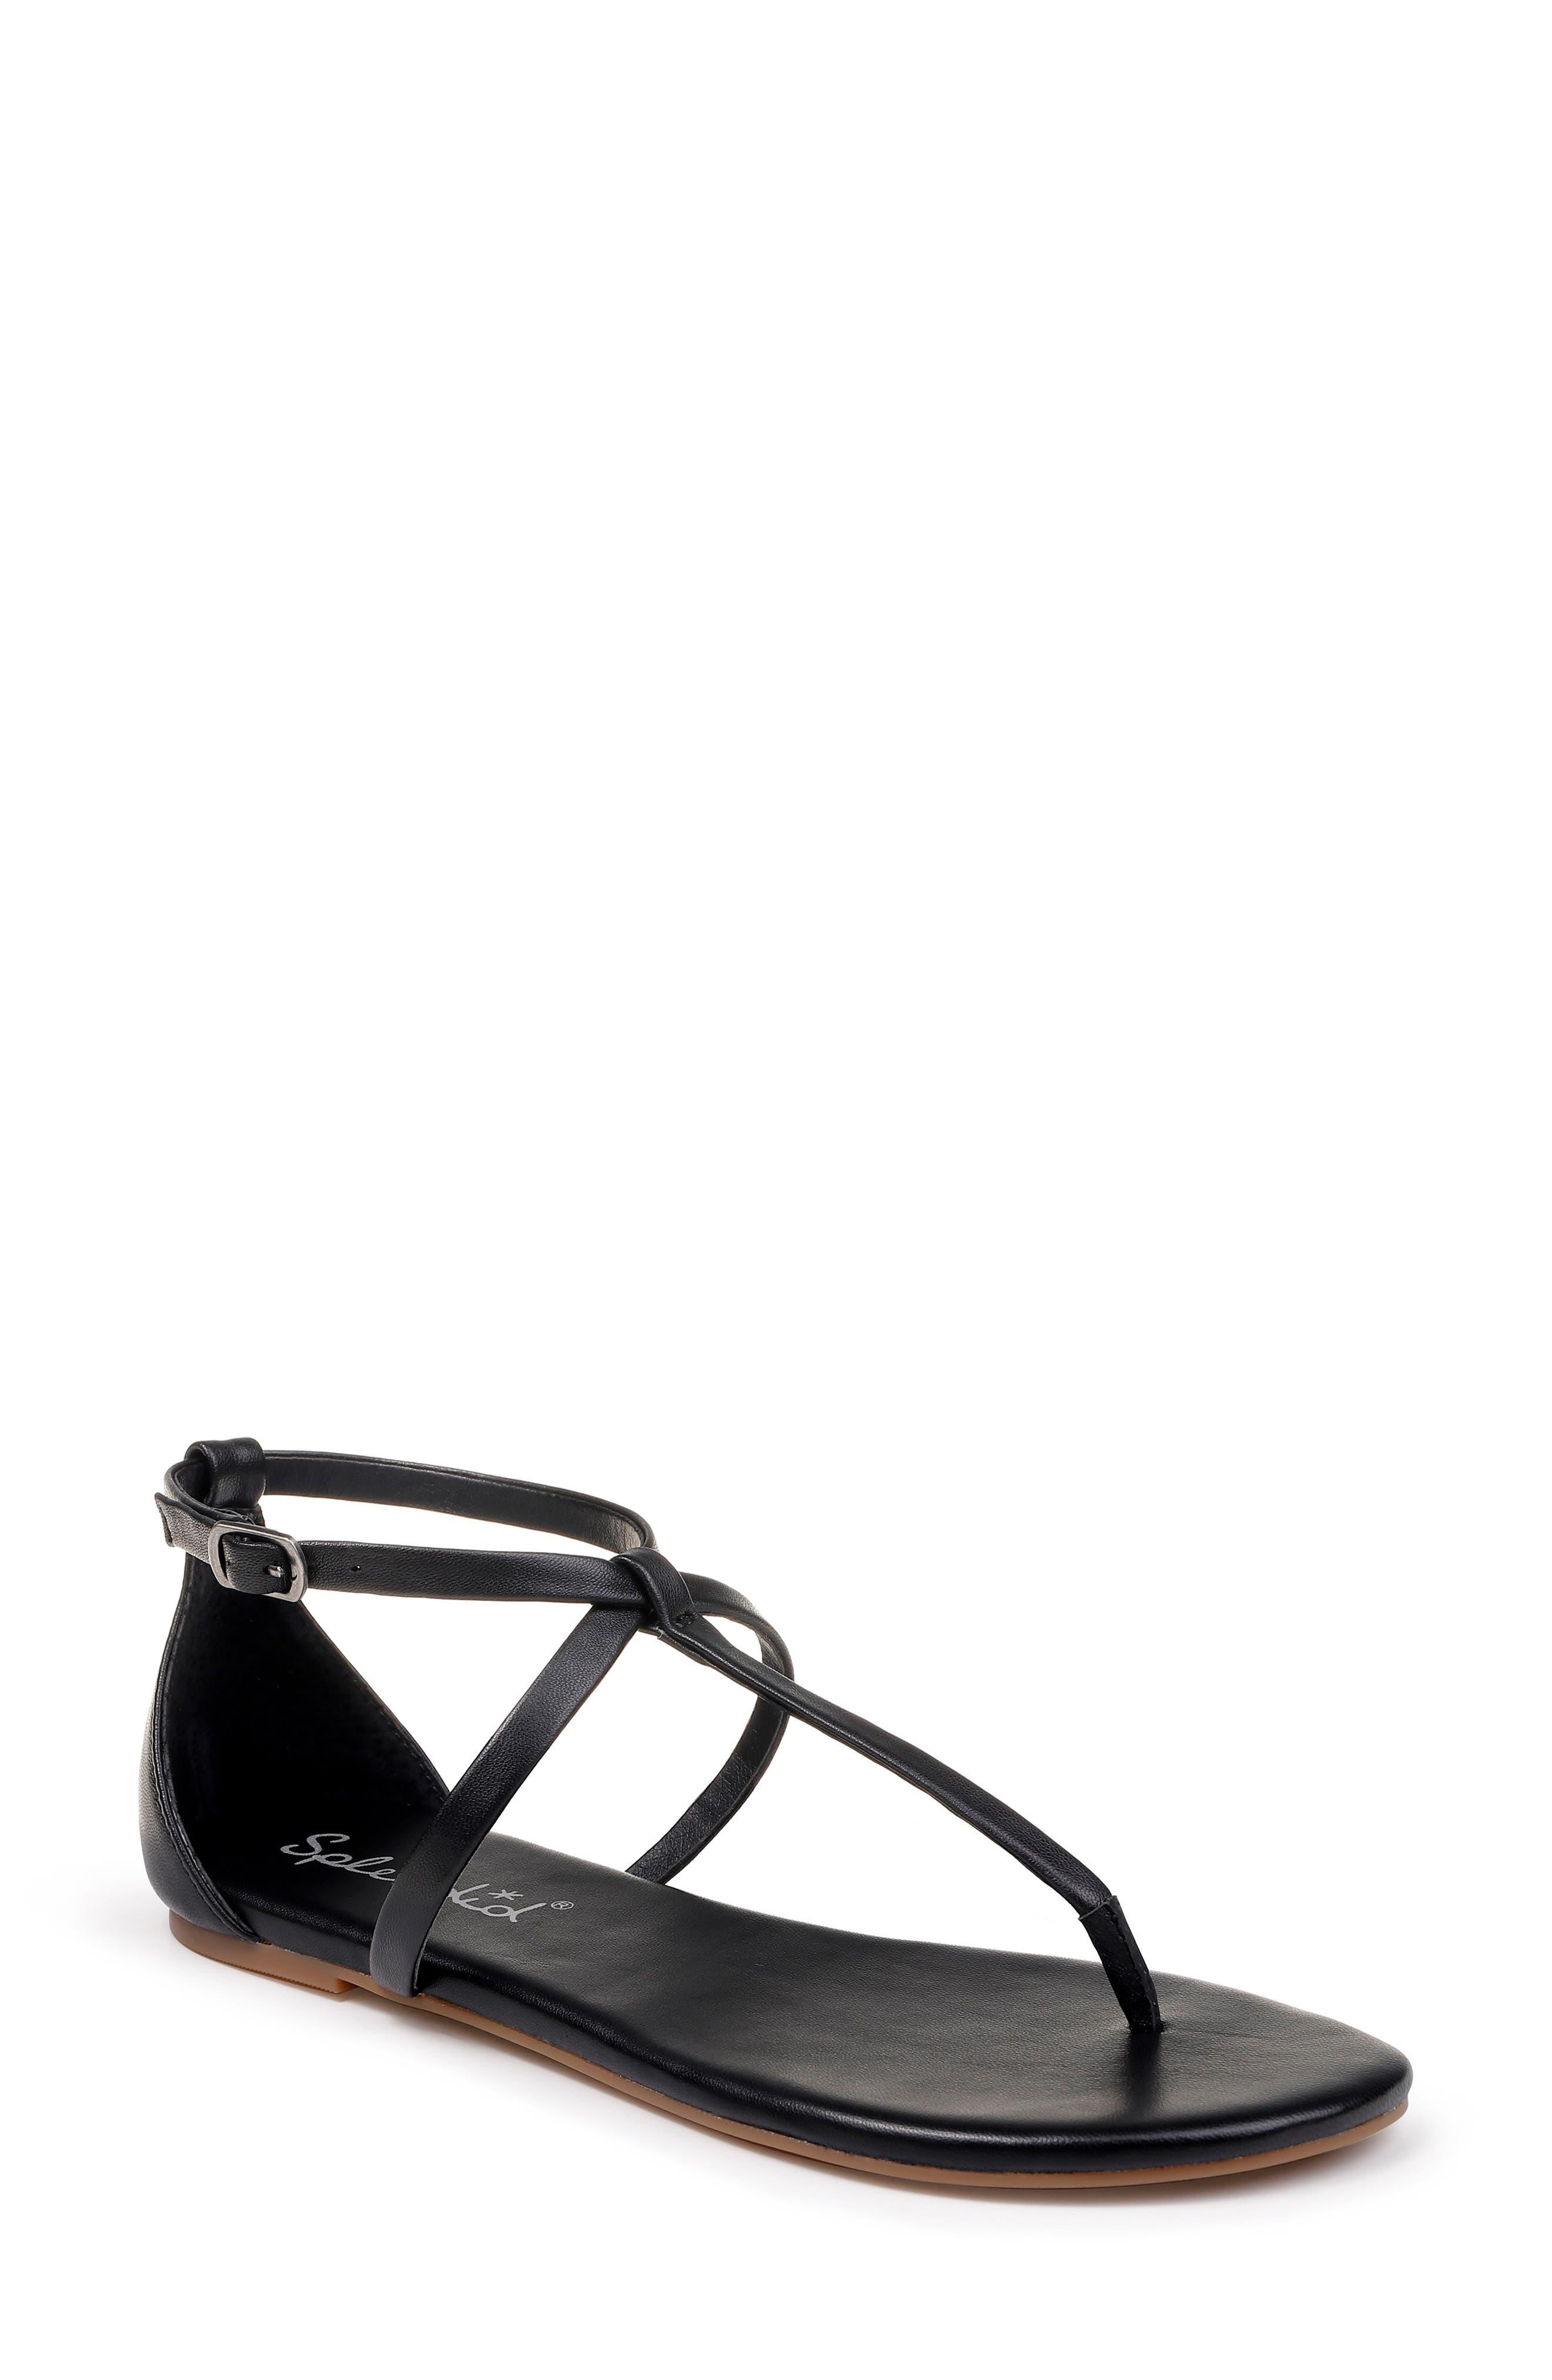 SPLENDID, Sundae T-Strap Sandal, Main thumbnail 1, color, BLACK LEATHER